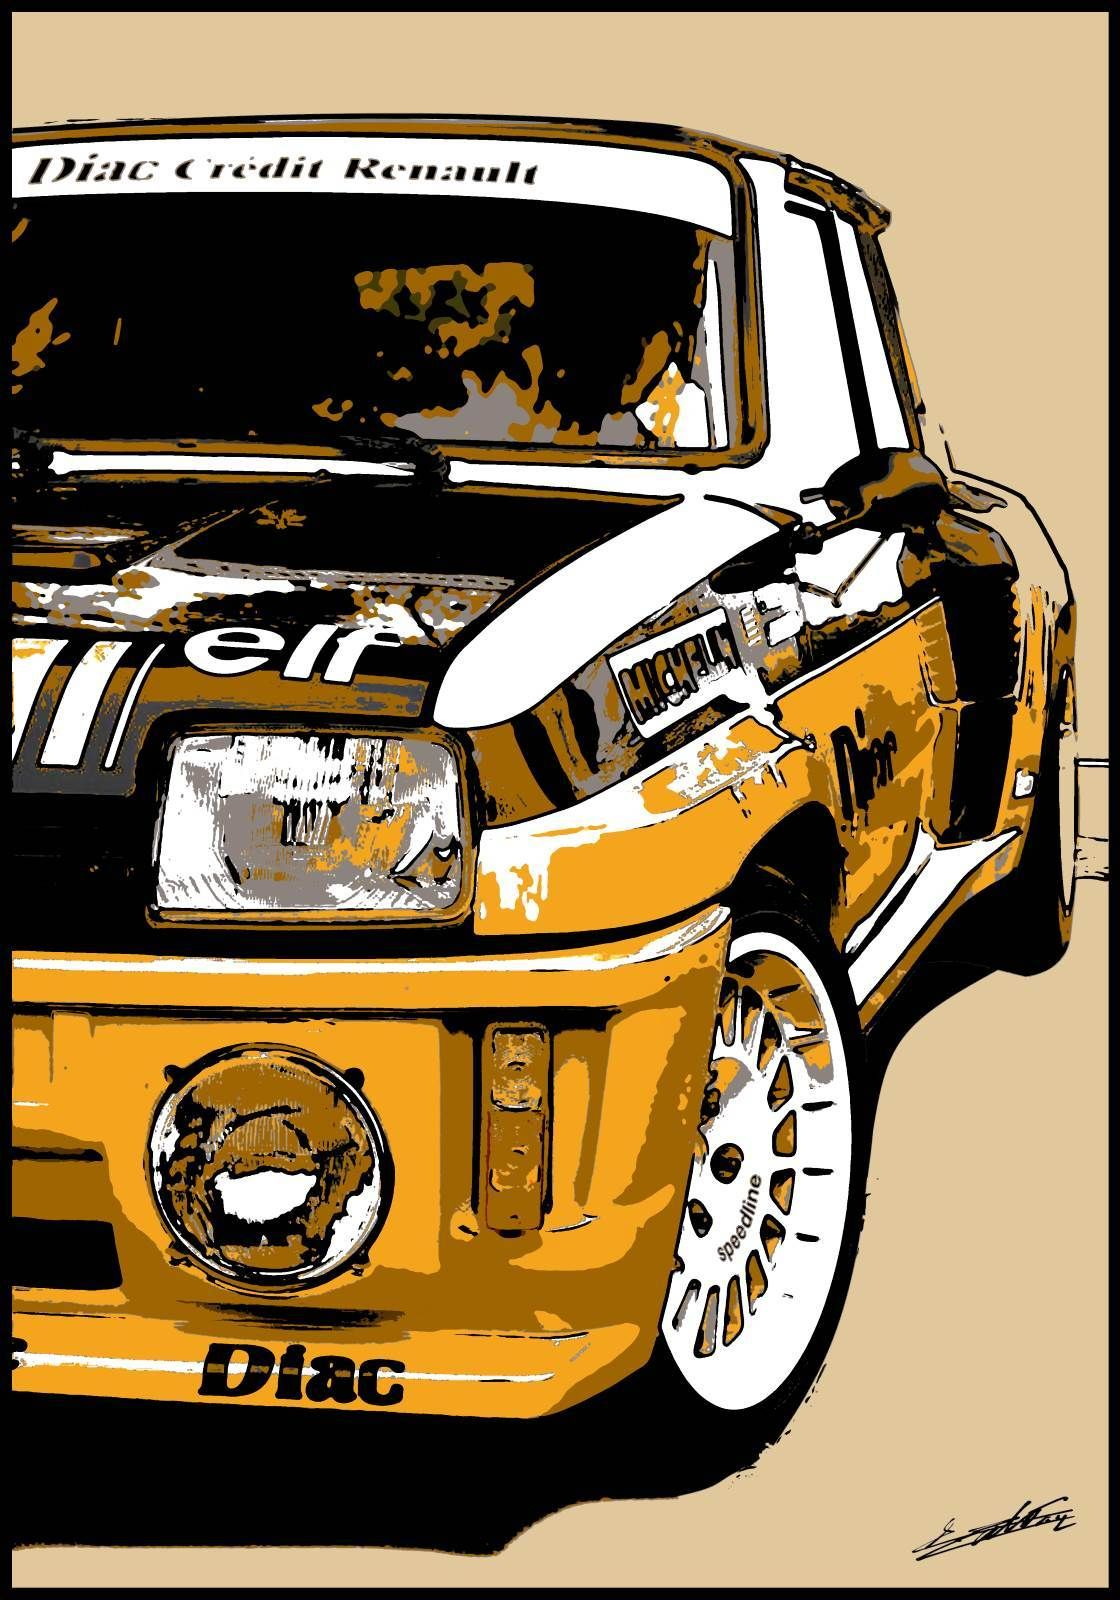 tableau voiture course sport fran aise comp tition rallye peinture pop art moderne deco design. Black Bedroom Furniture Sets. Home Design Ideas